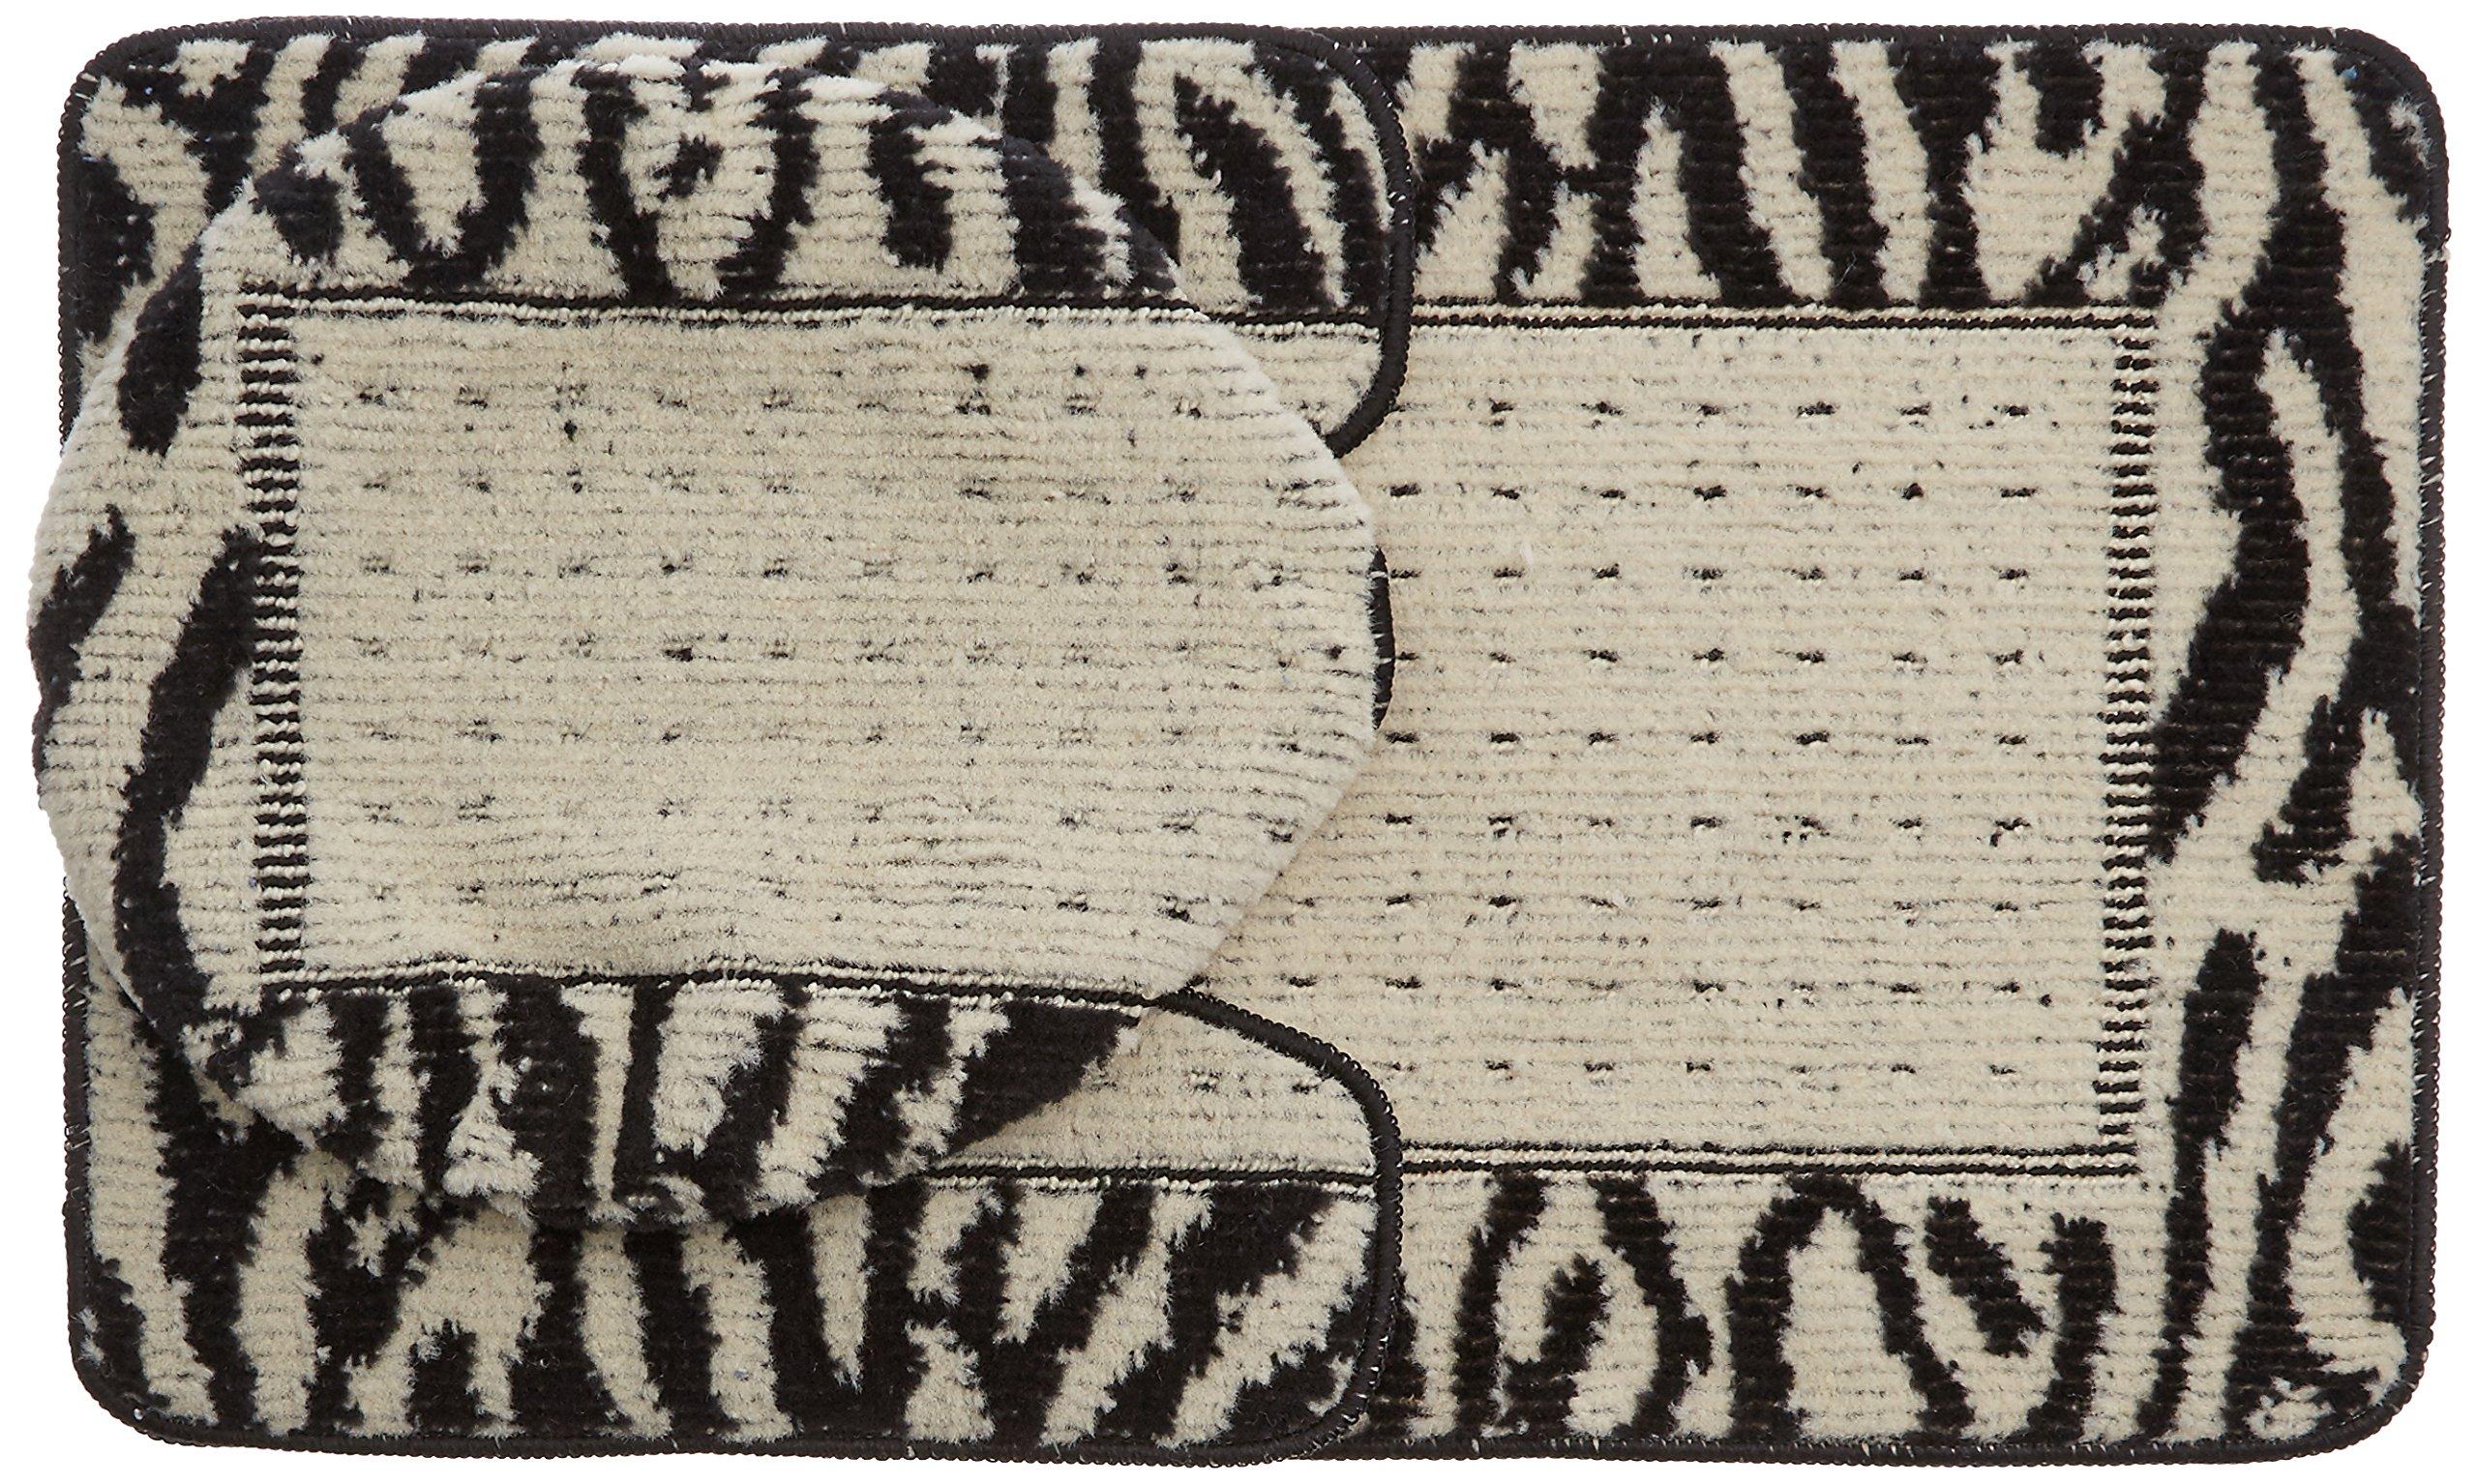 Dainty Home 3-Piece Animal Design Rug/Contour/Lid Cover Bath Set, Black/Ivory